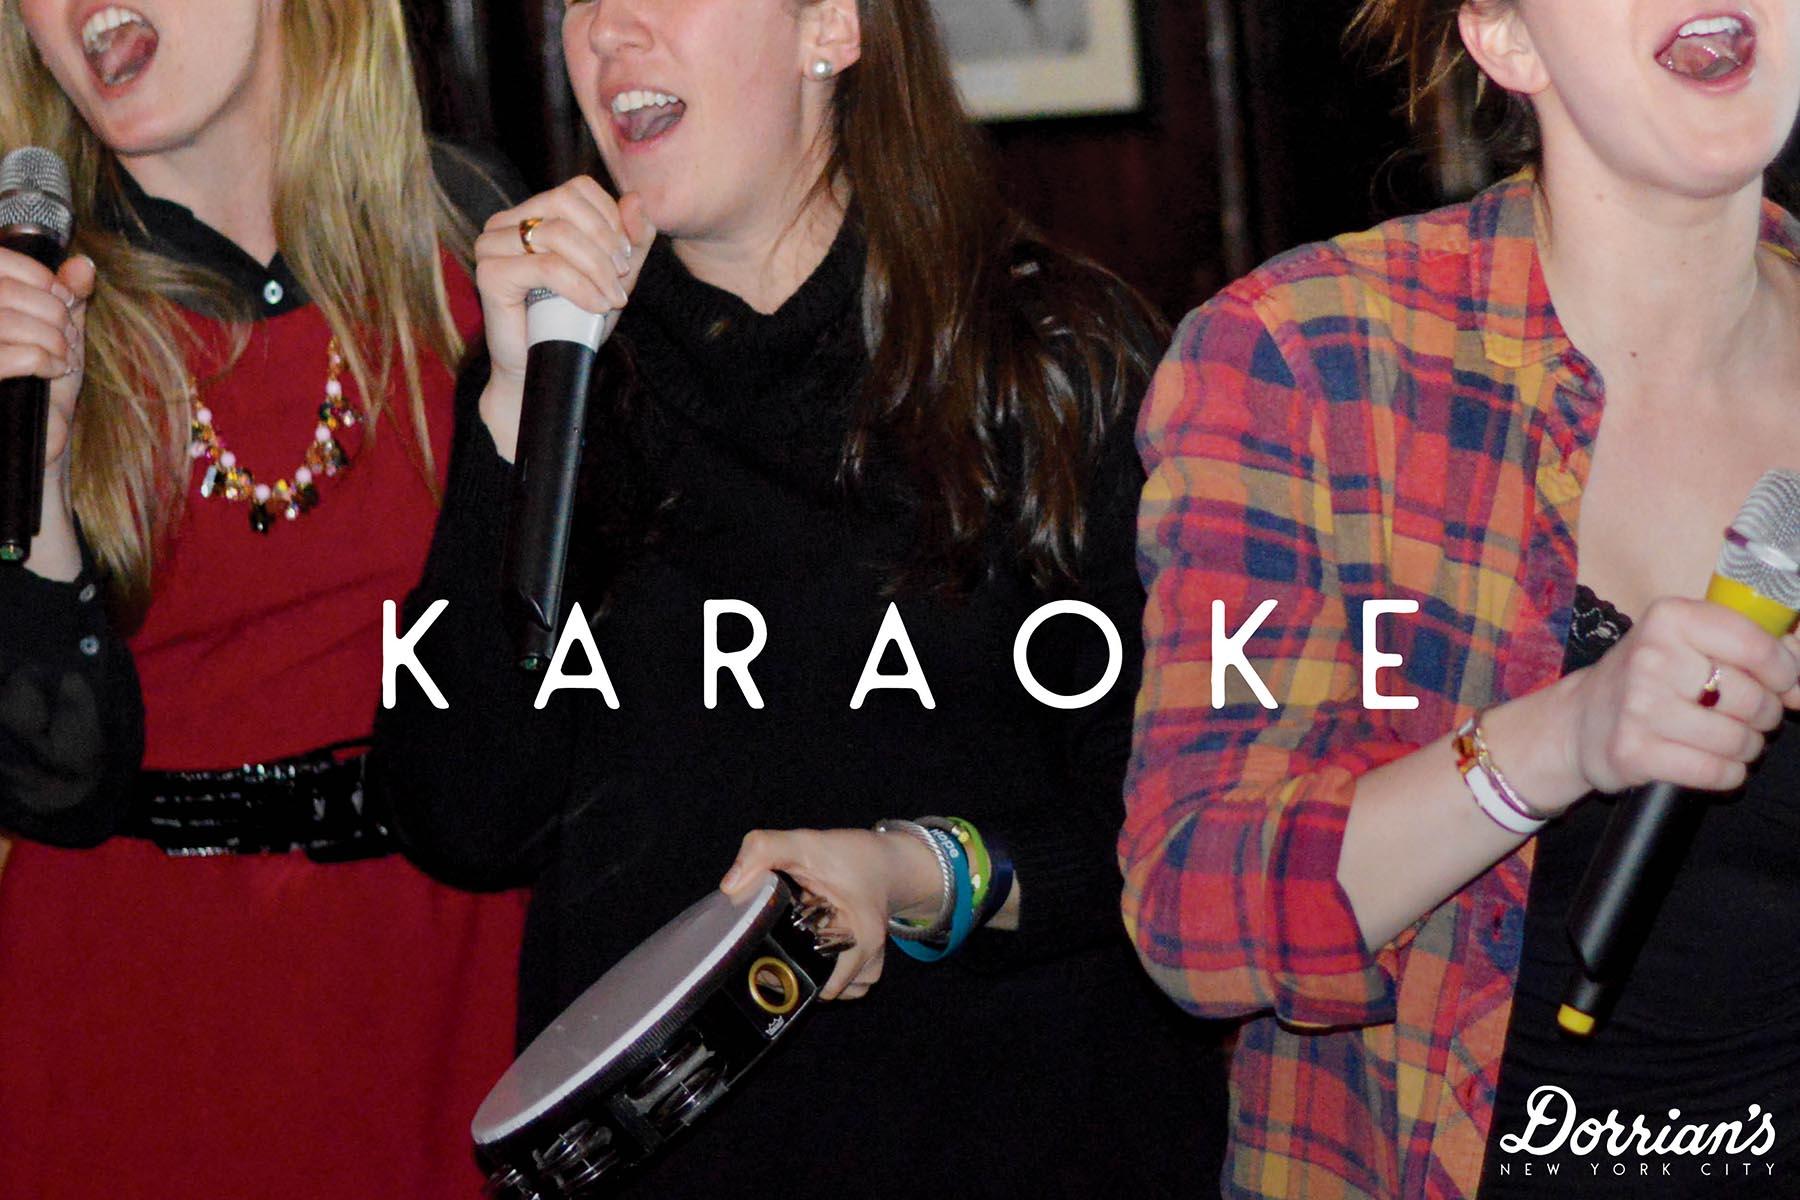 drh_nyc-2019-insta-events-karaoke-four-girls-1200-hor.jpg